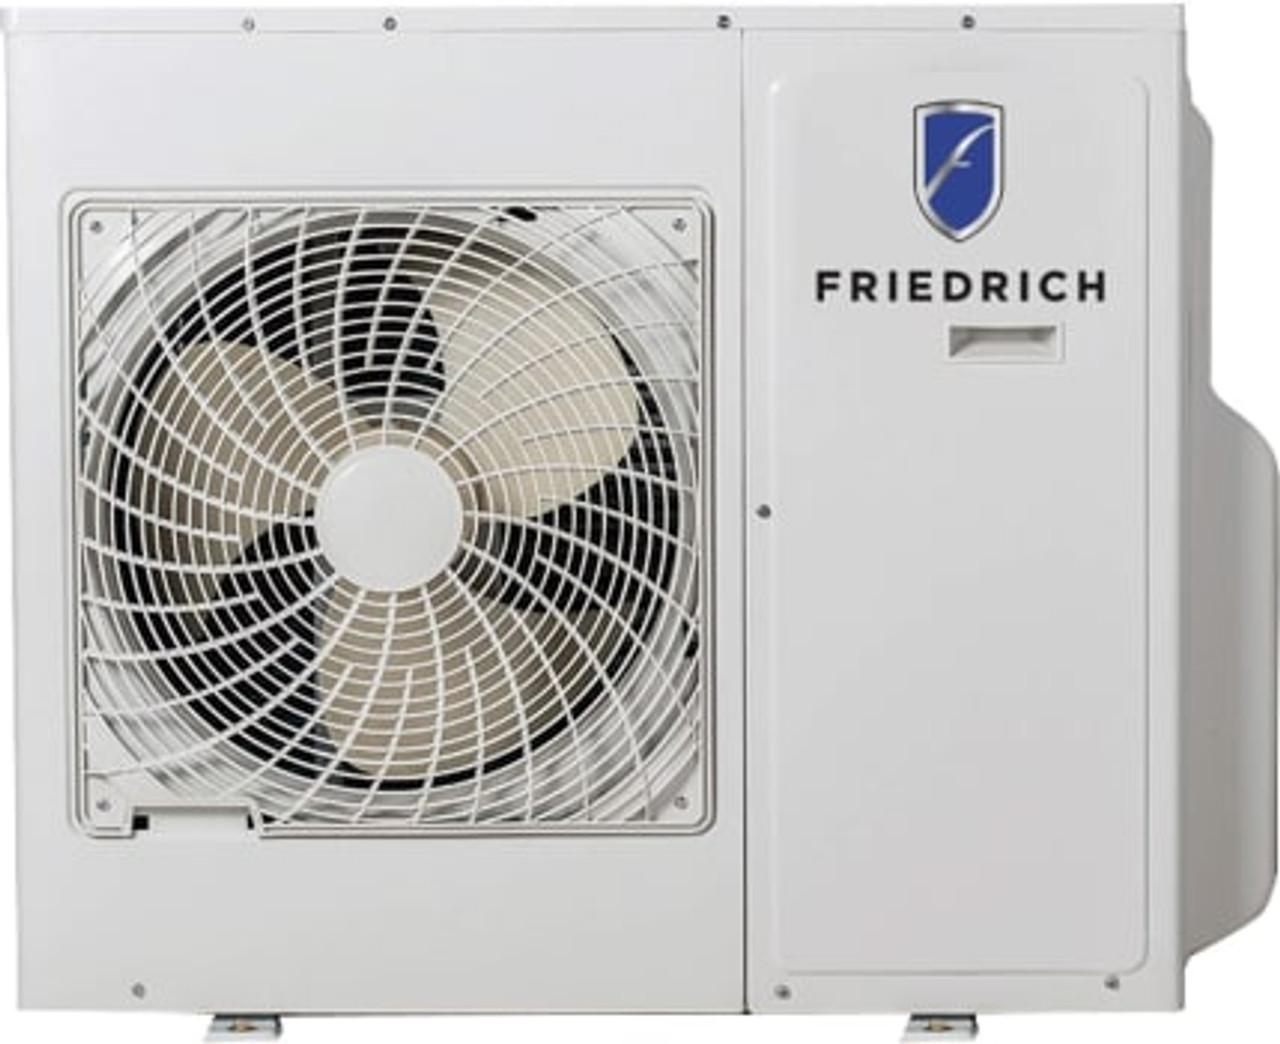 Friedrich FPHMR18A3A Floating Air Multi Zone Outdoor Unit with 24000 Nominal BTU, Soft Start Compressor,